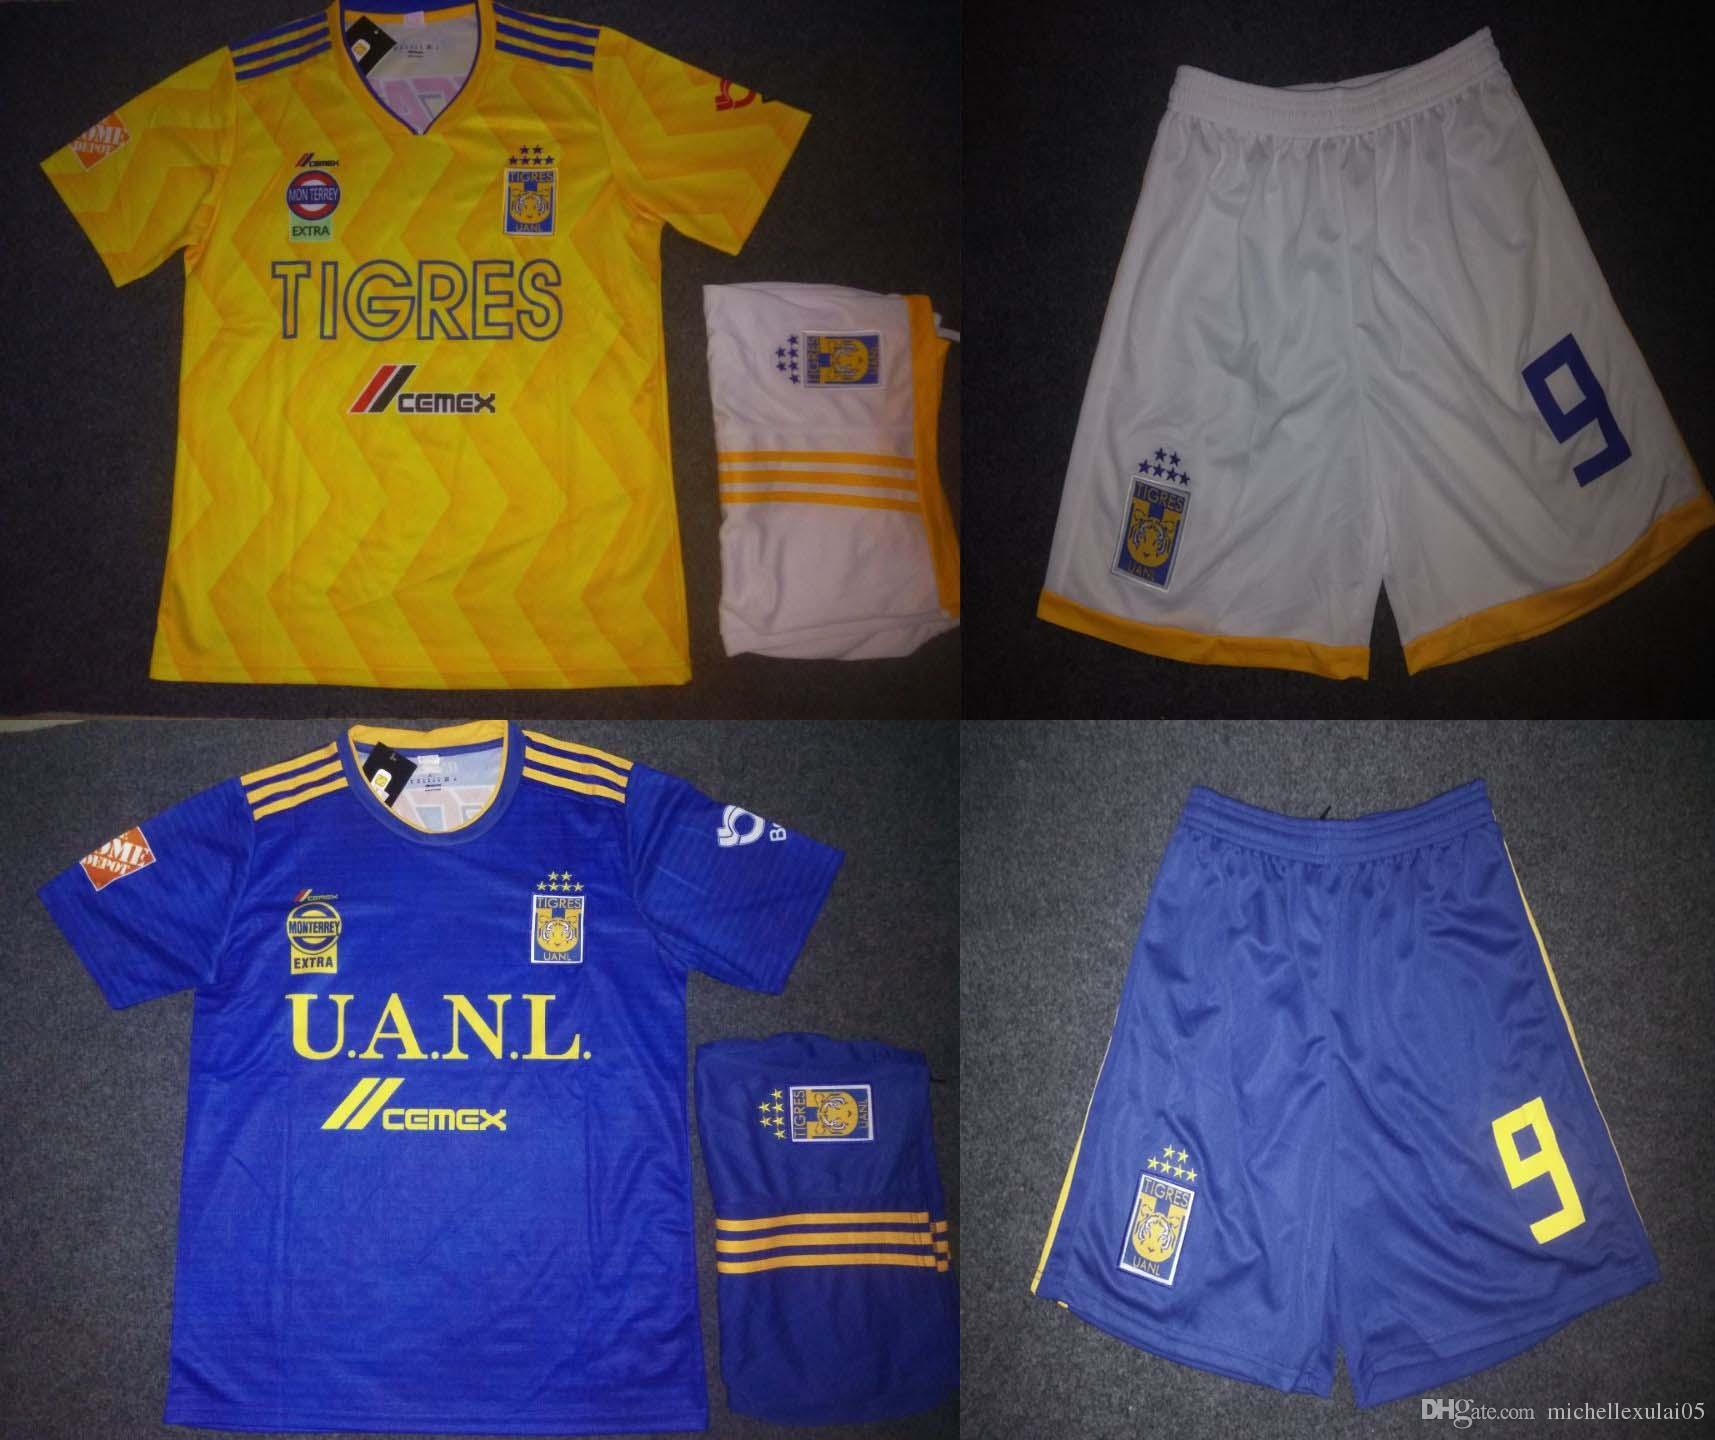 69e19e3ae 18 19 Tigres UANL Soccer Kits Men s Thai Quality Football Sets GIGNAC  VARGAS Soccer Jerseys Shorts Adult s Sports Training Suits Uniforms